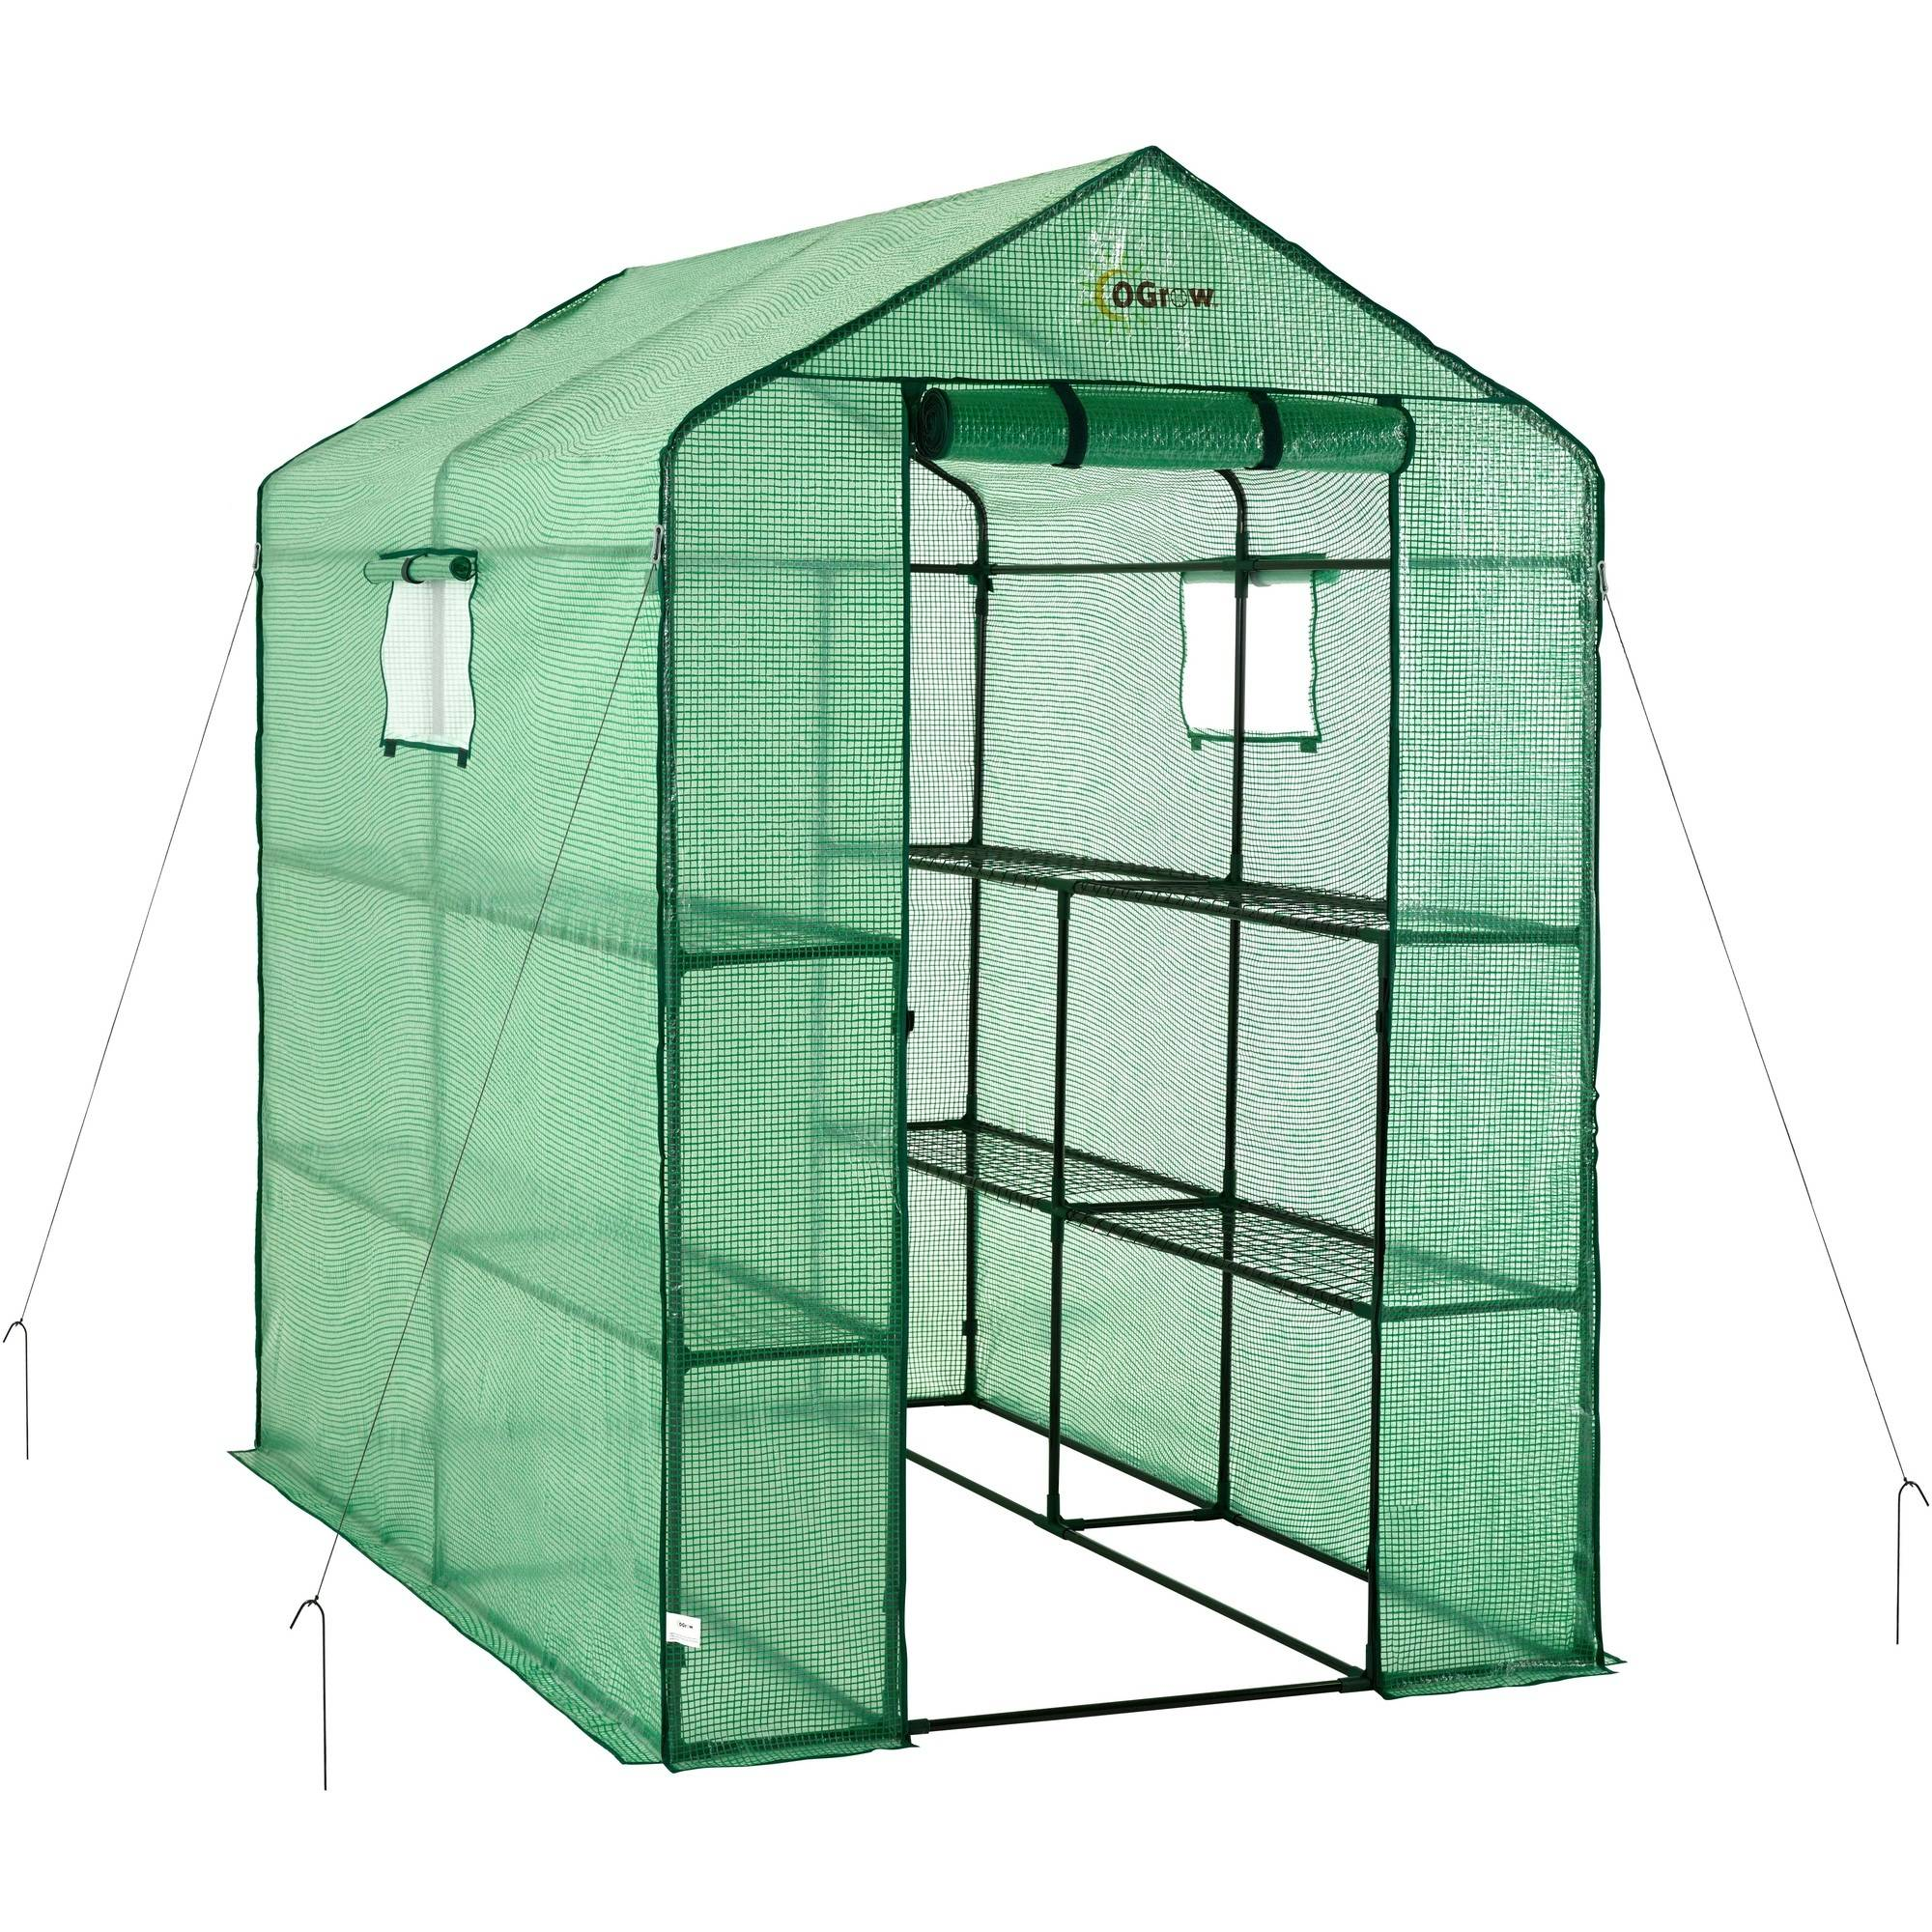 Ogrow Large Heavy-Duty Walk-In 2-Tier 8-Shelf Portable Lawn and Garden Greenhouse